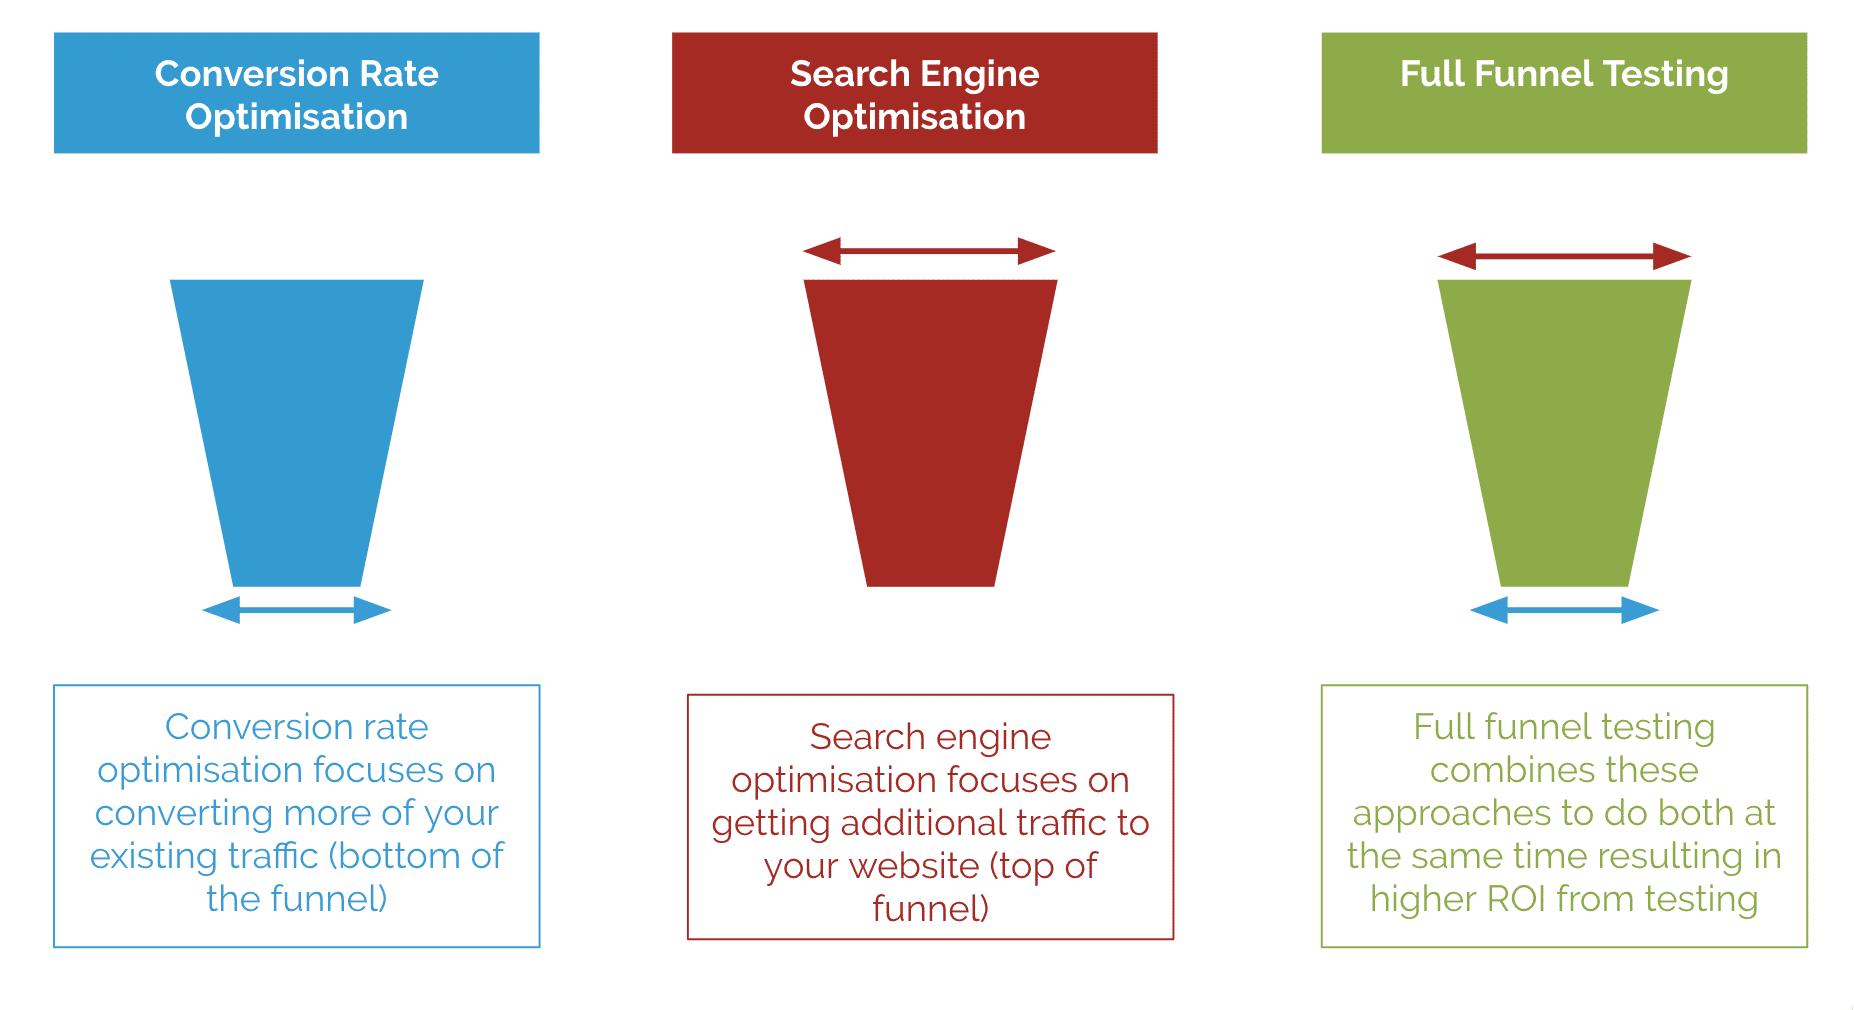 CRO, SEO and Full-Funnel testing